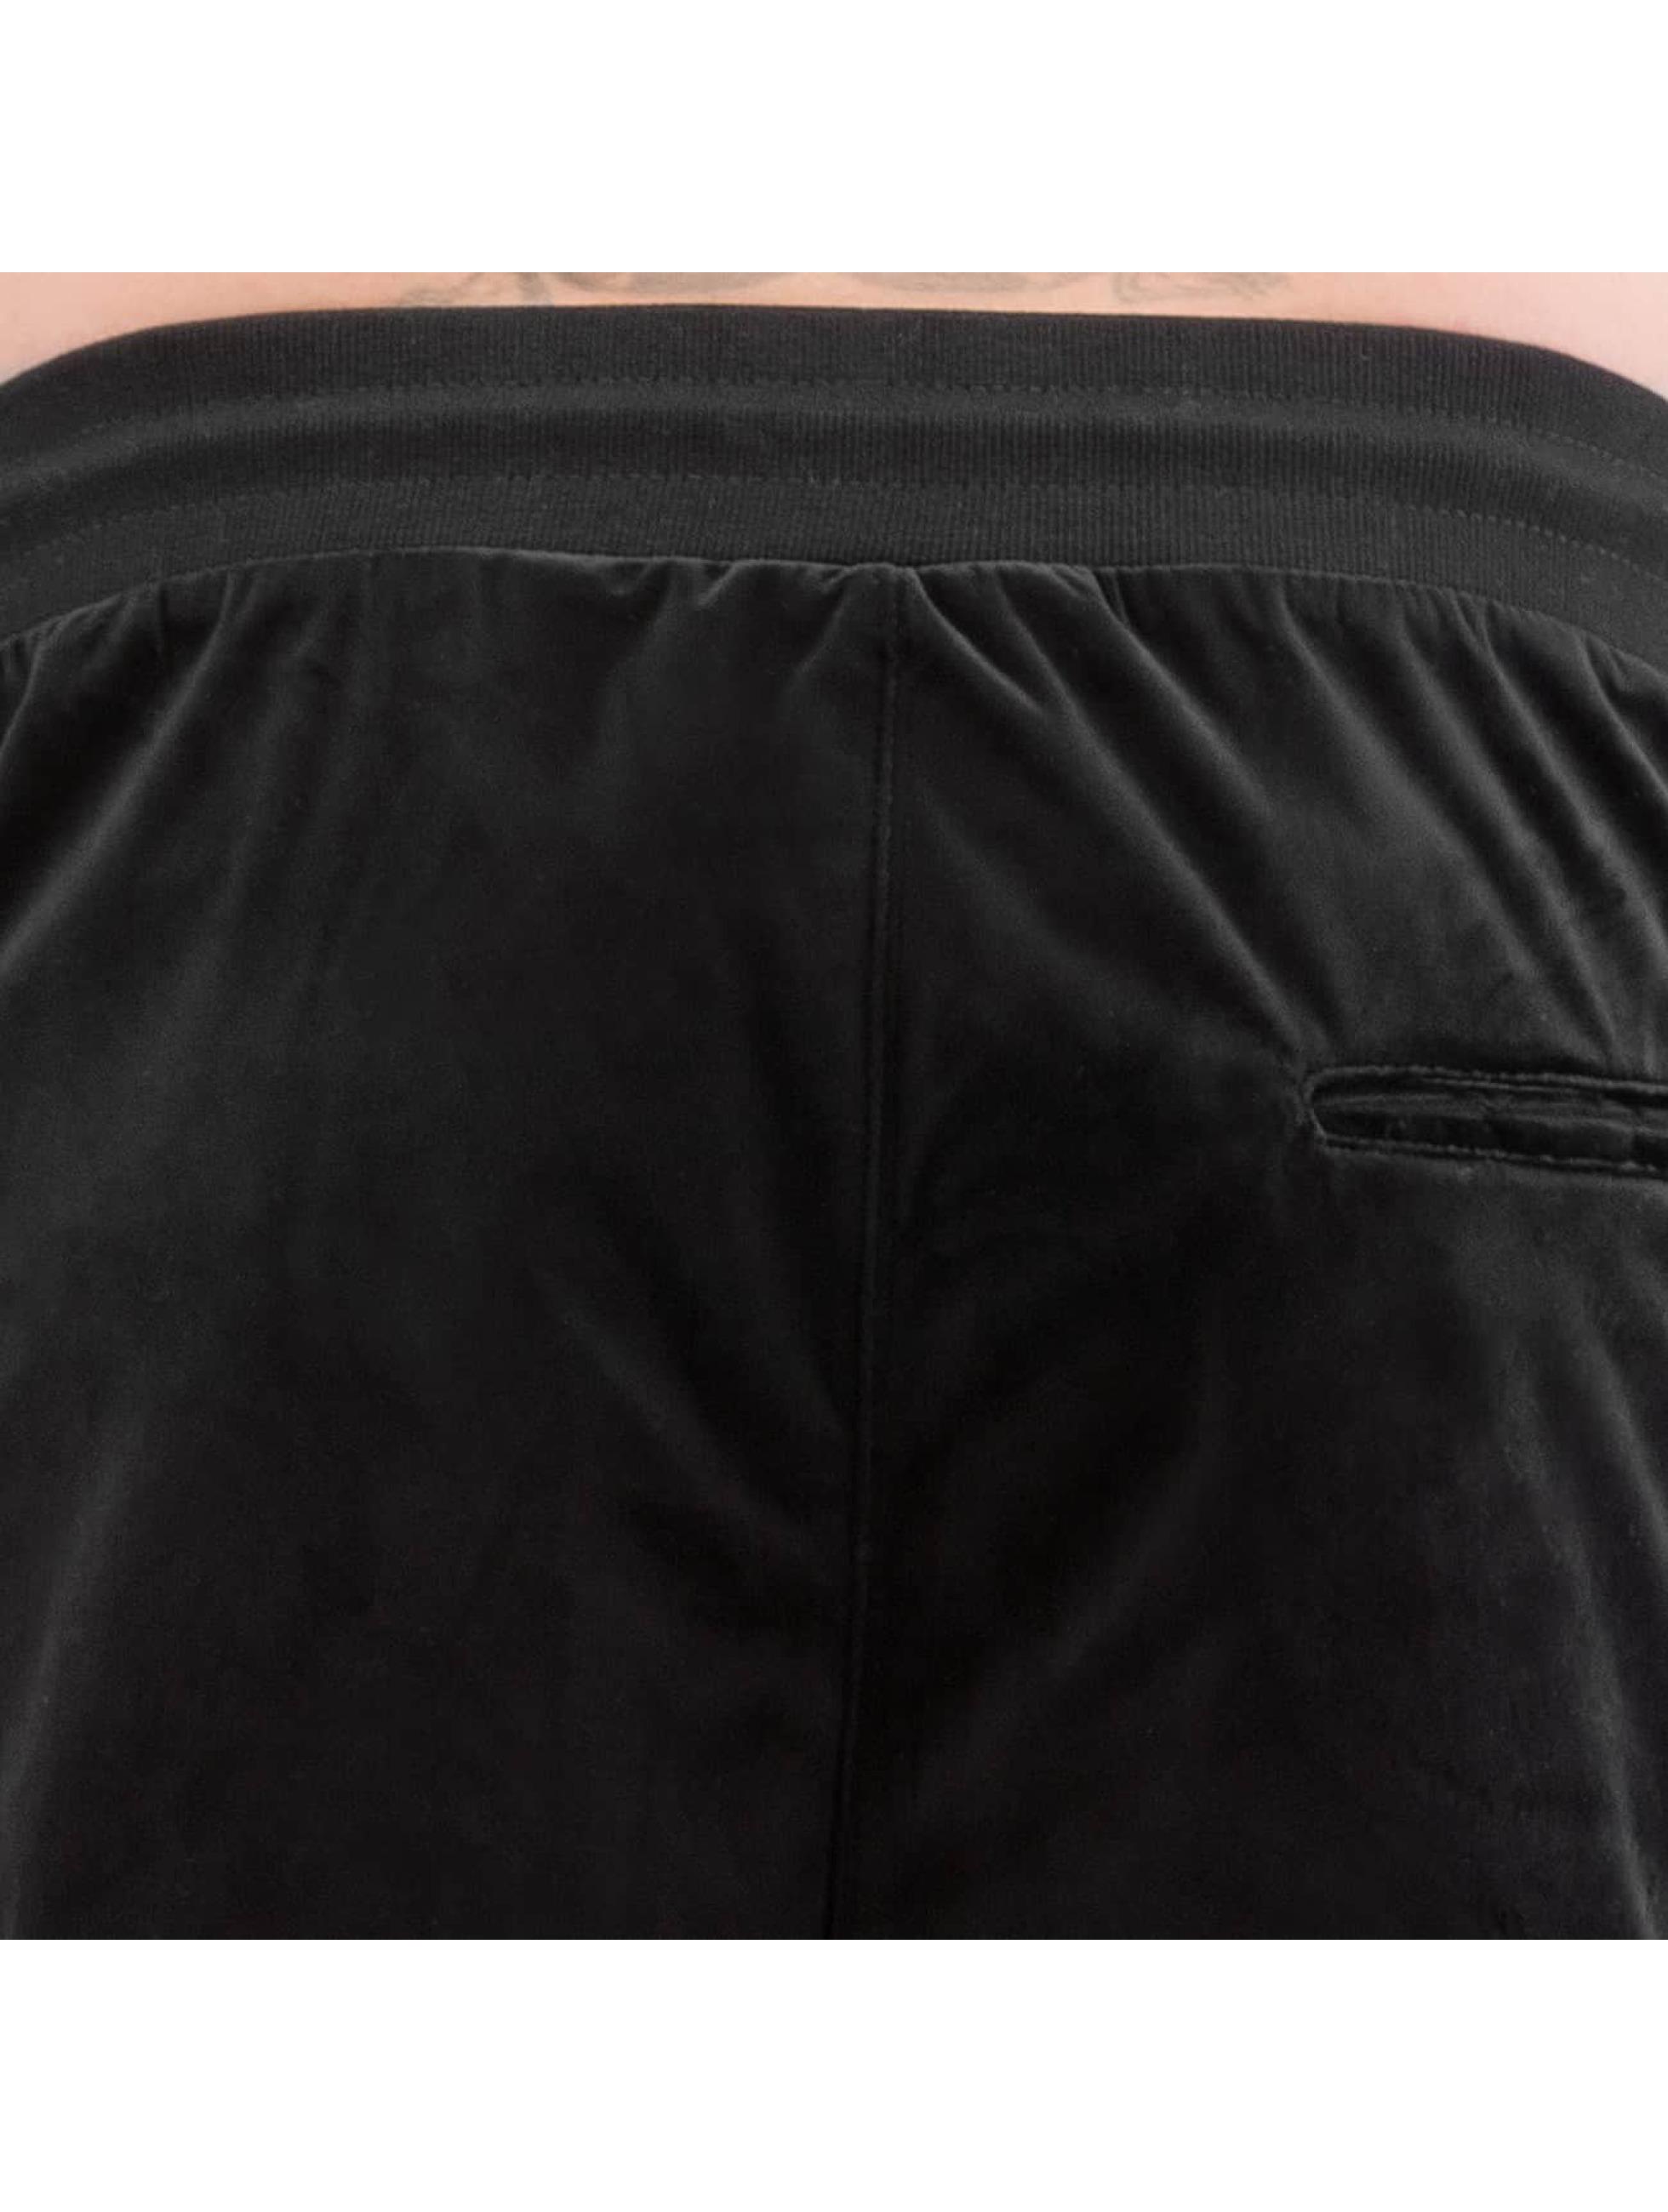 CHABOS IIVII Jogginghose Core Velour Samt schwarz